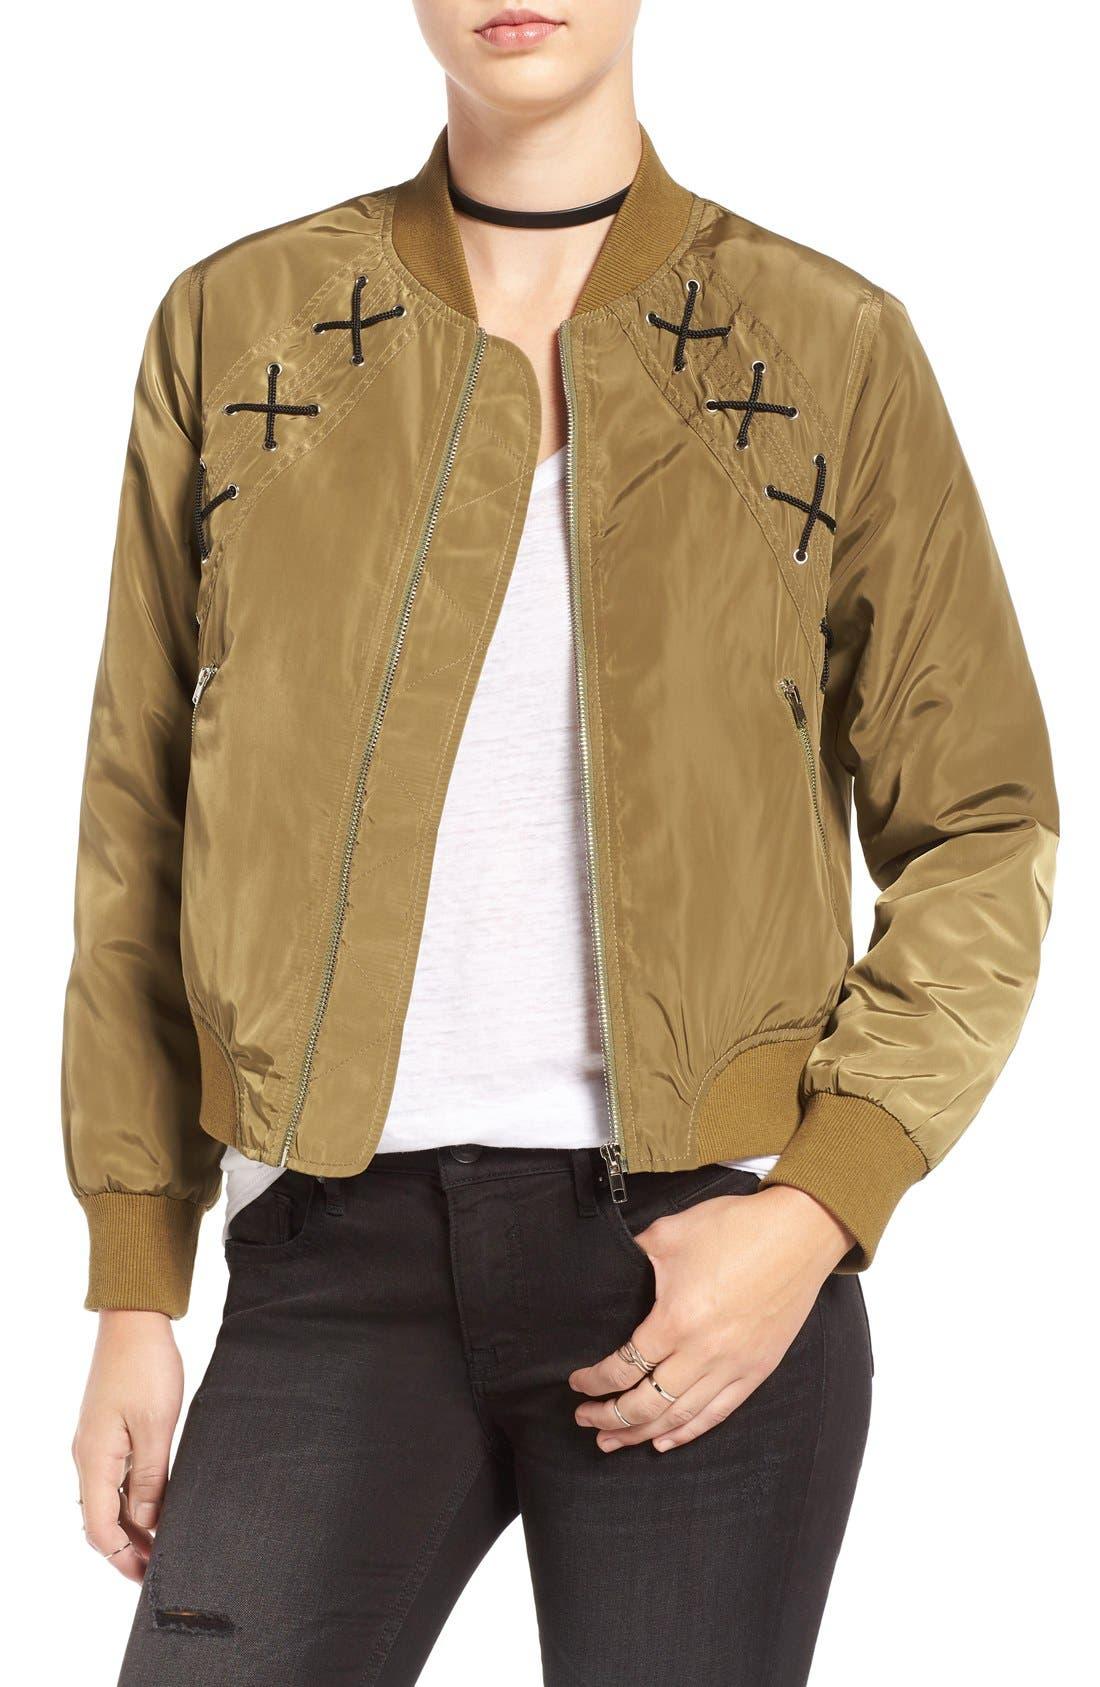 Alternate Image 1 Selected - Elodie Cross Stitch Bomber Jacket